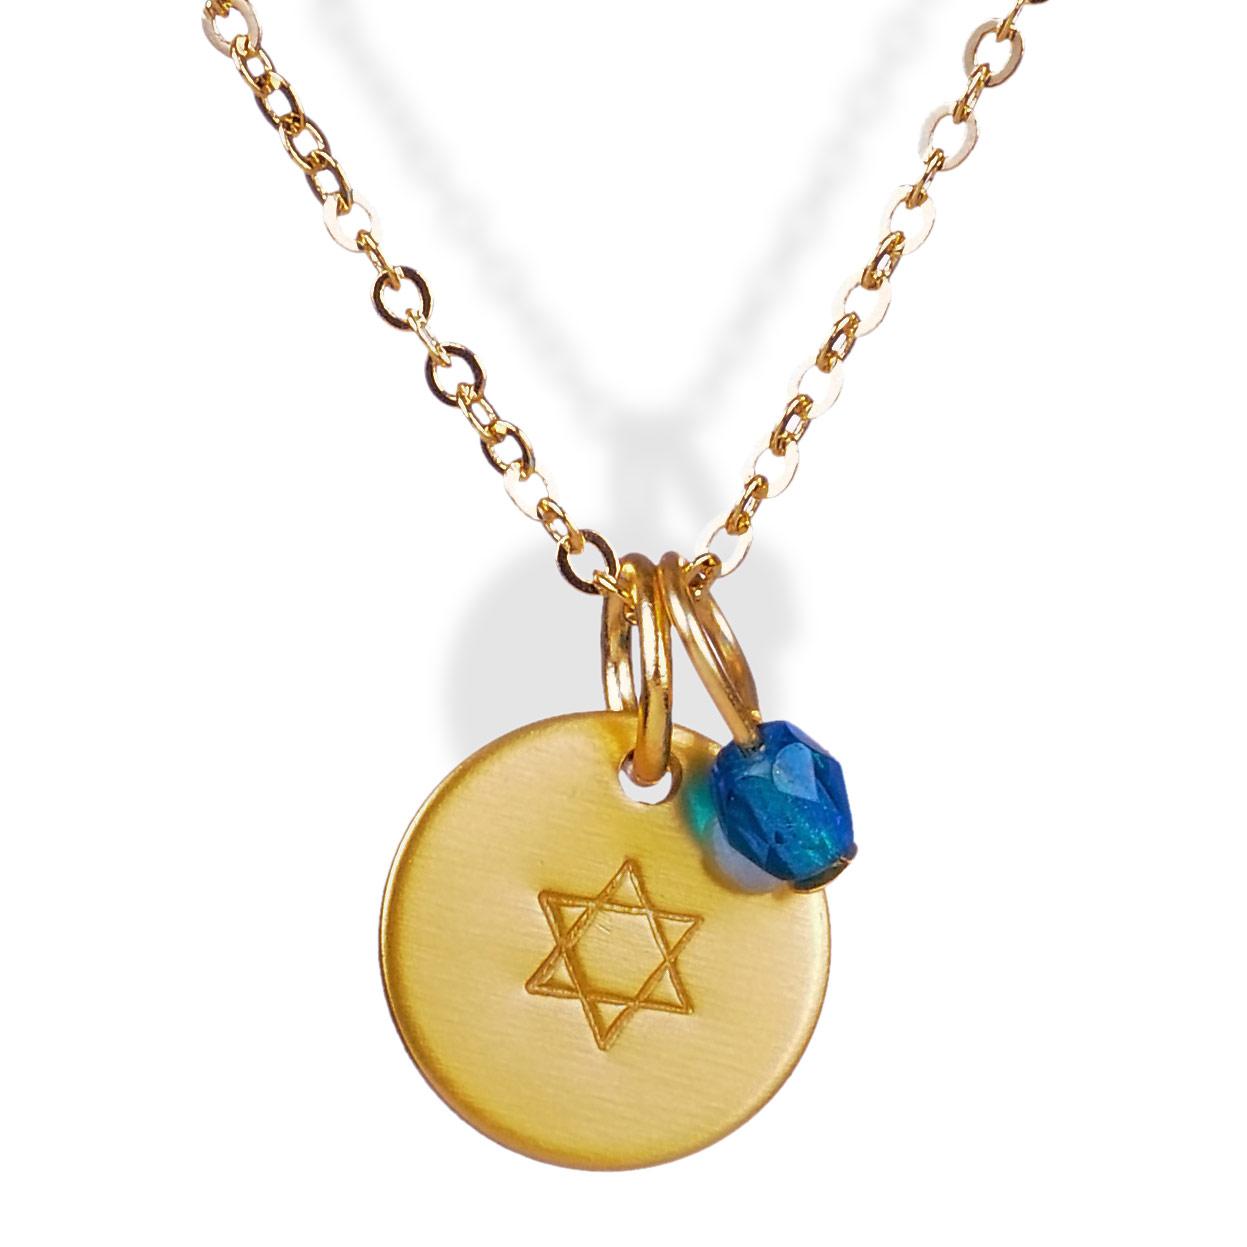 Jewish JewelryGold Tone Jewish Star Disk Ladies Necklace With Bead